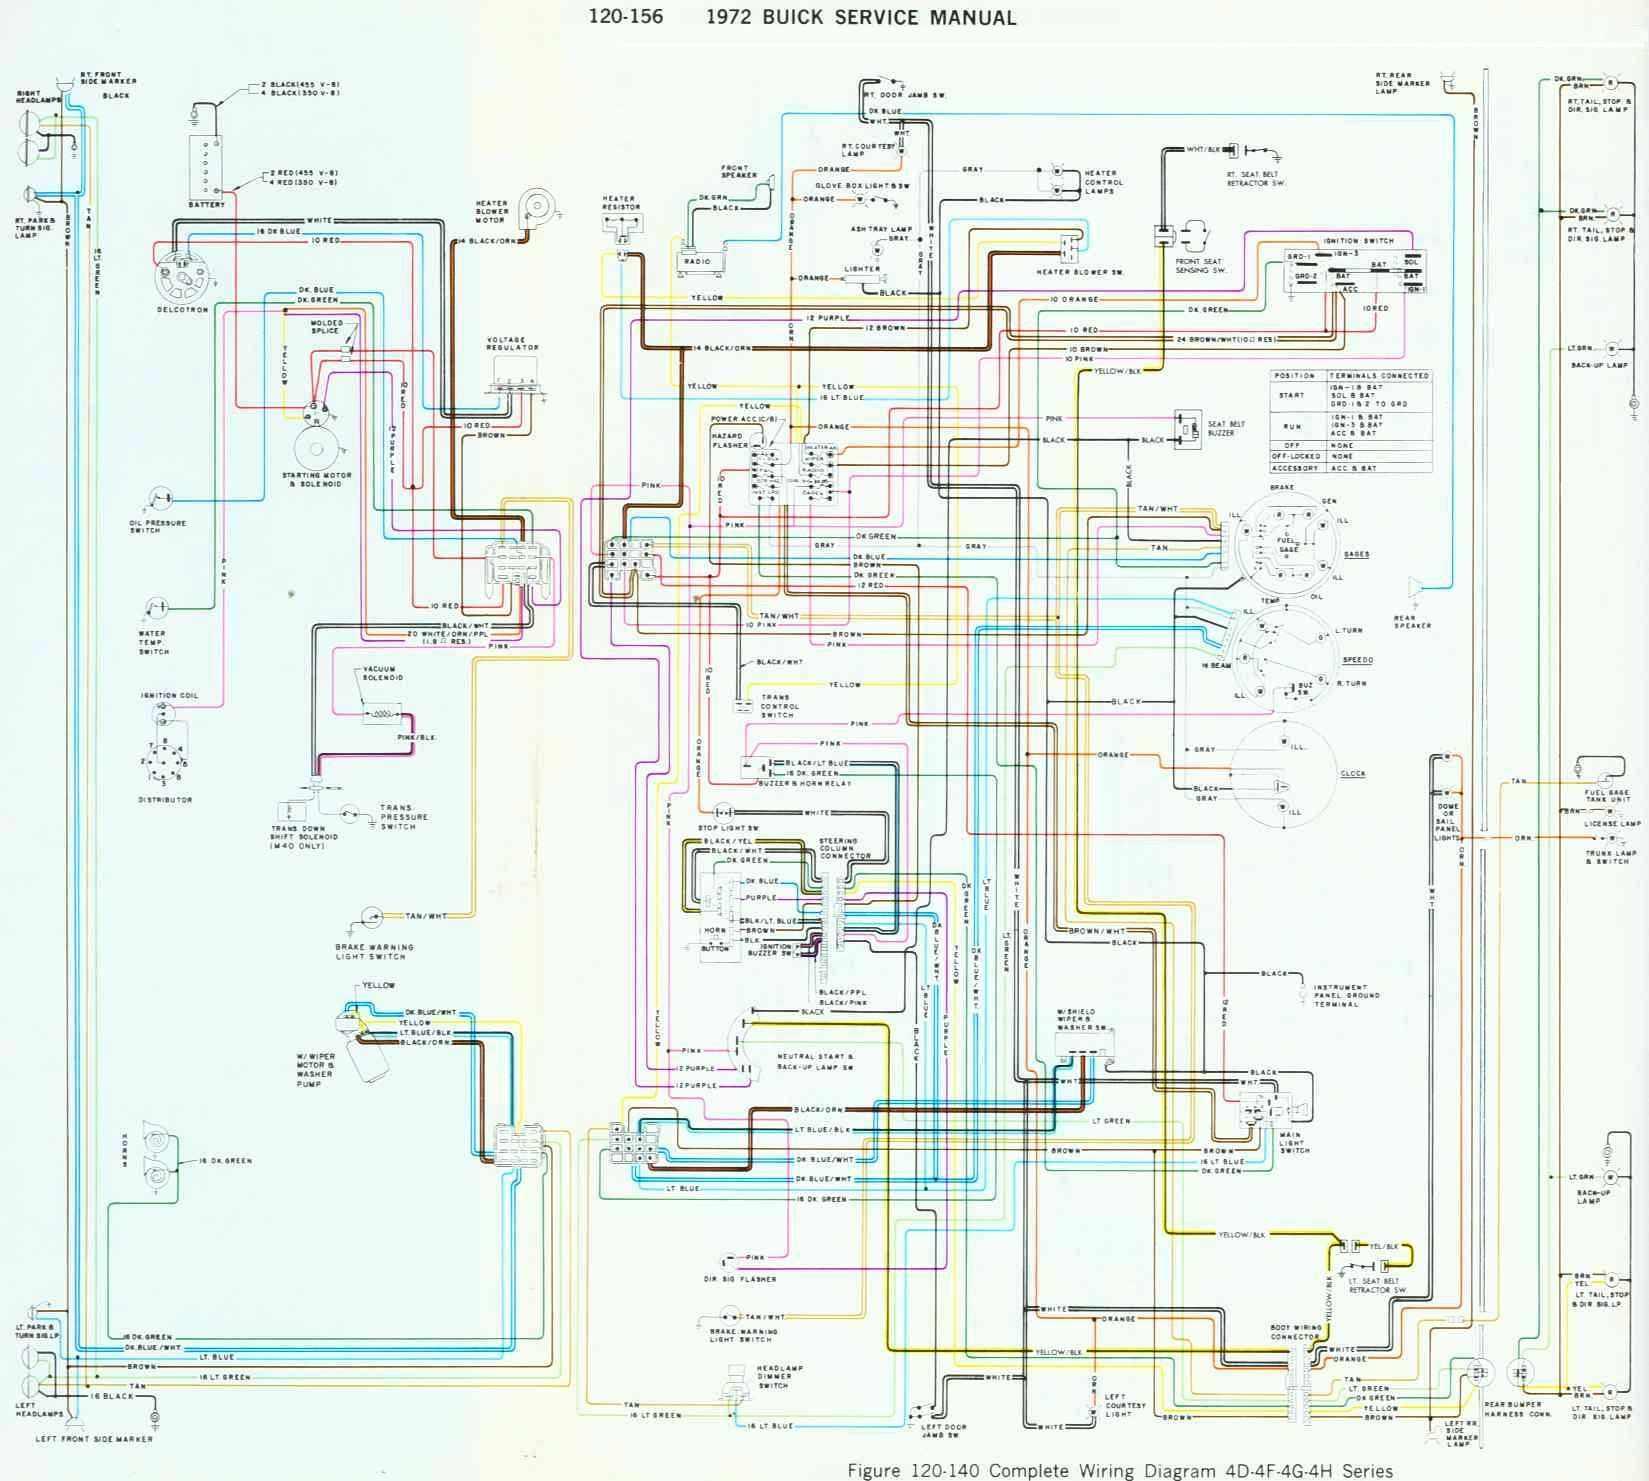 small resolution of 1952 plymouth cranbrook wiring diagram wiring library rh 14 codingcommunity de 1968 dodge dart wiring